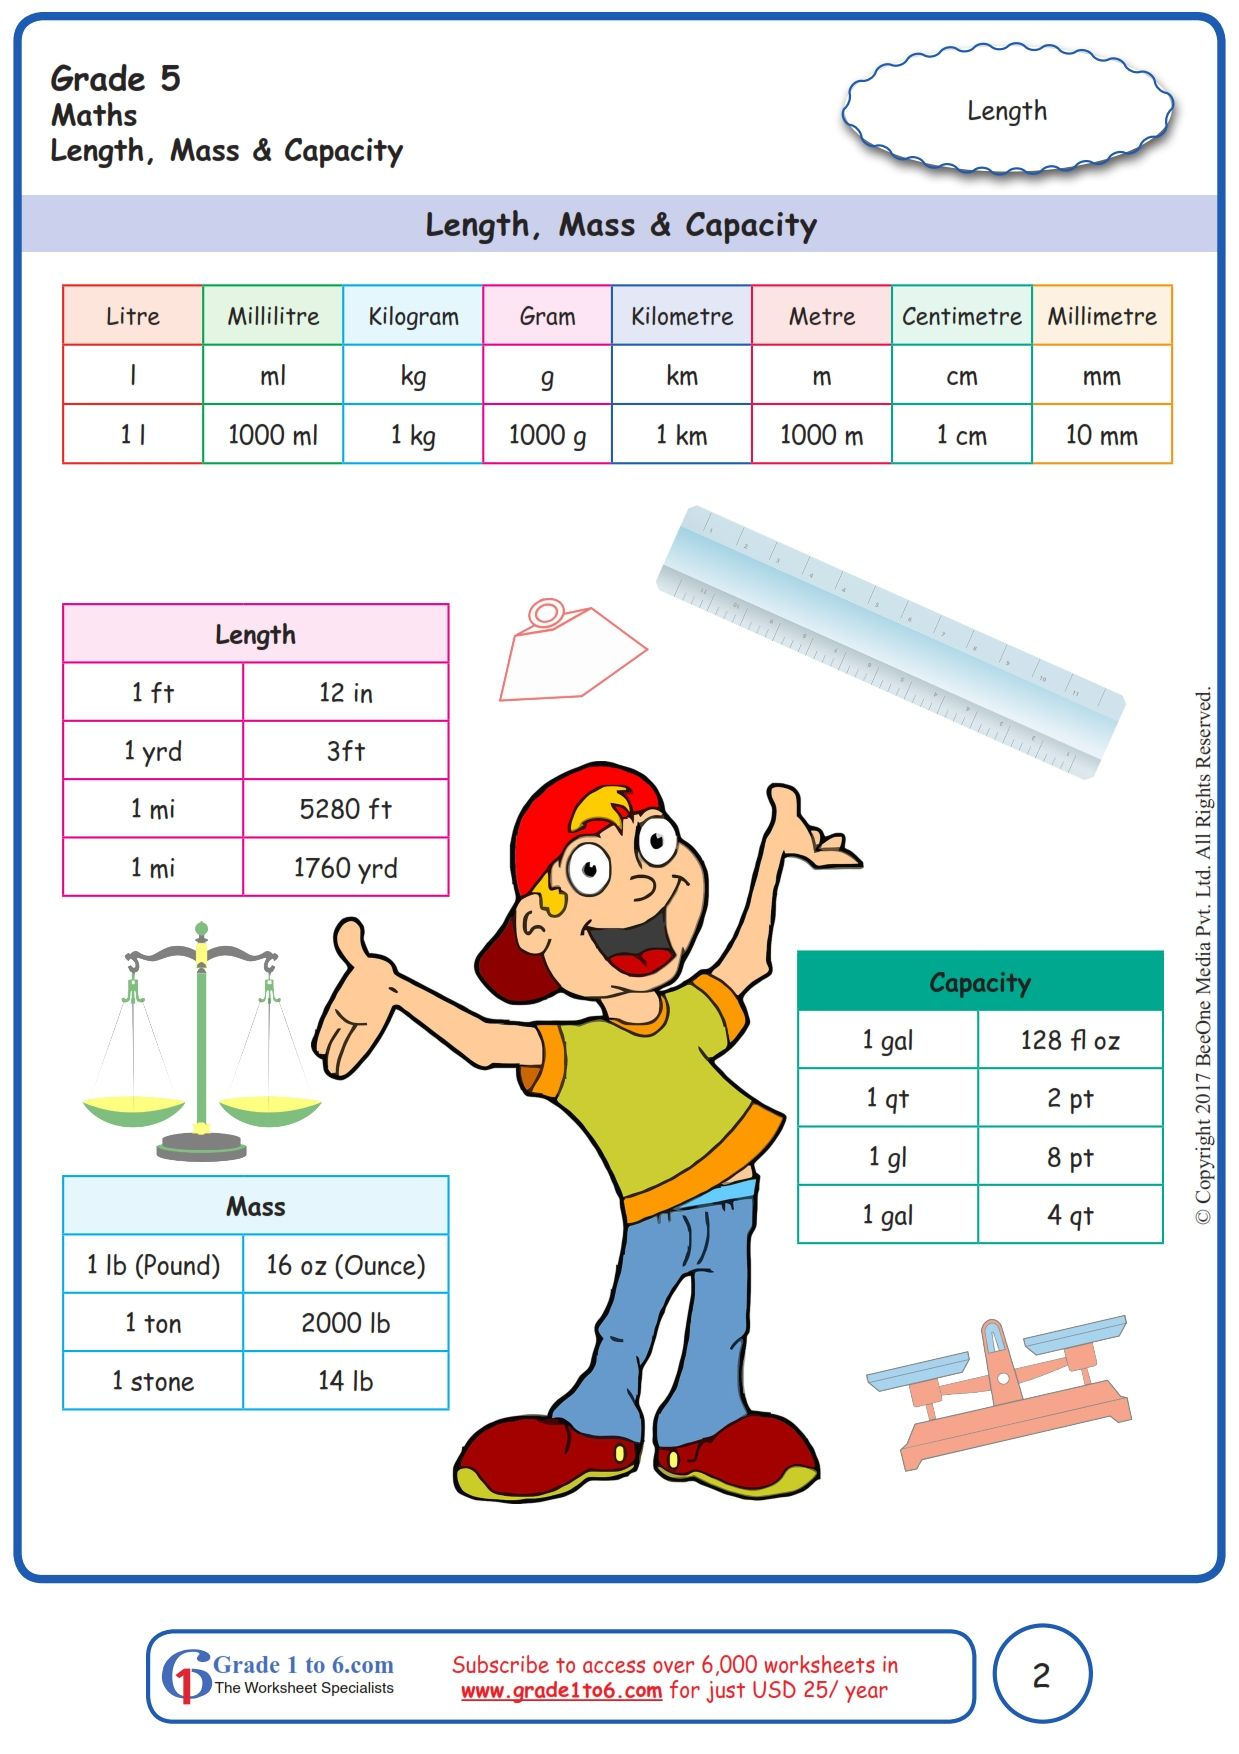 medium resolution of Worksheet Grade 5 Math Length Mass \u0026 Capacity   Free math worksheets